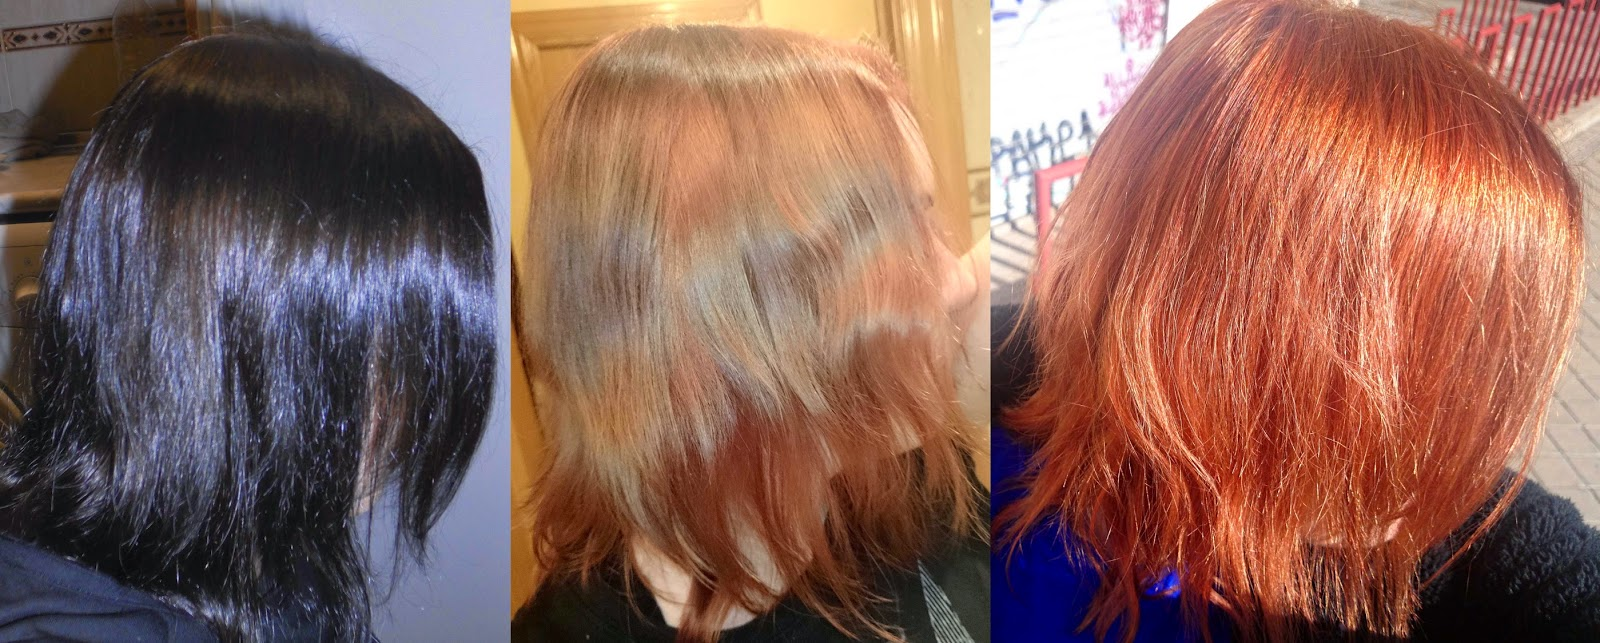 conseguir un pelirrojo natural cabello pelirrojo